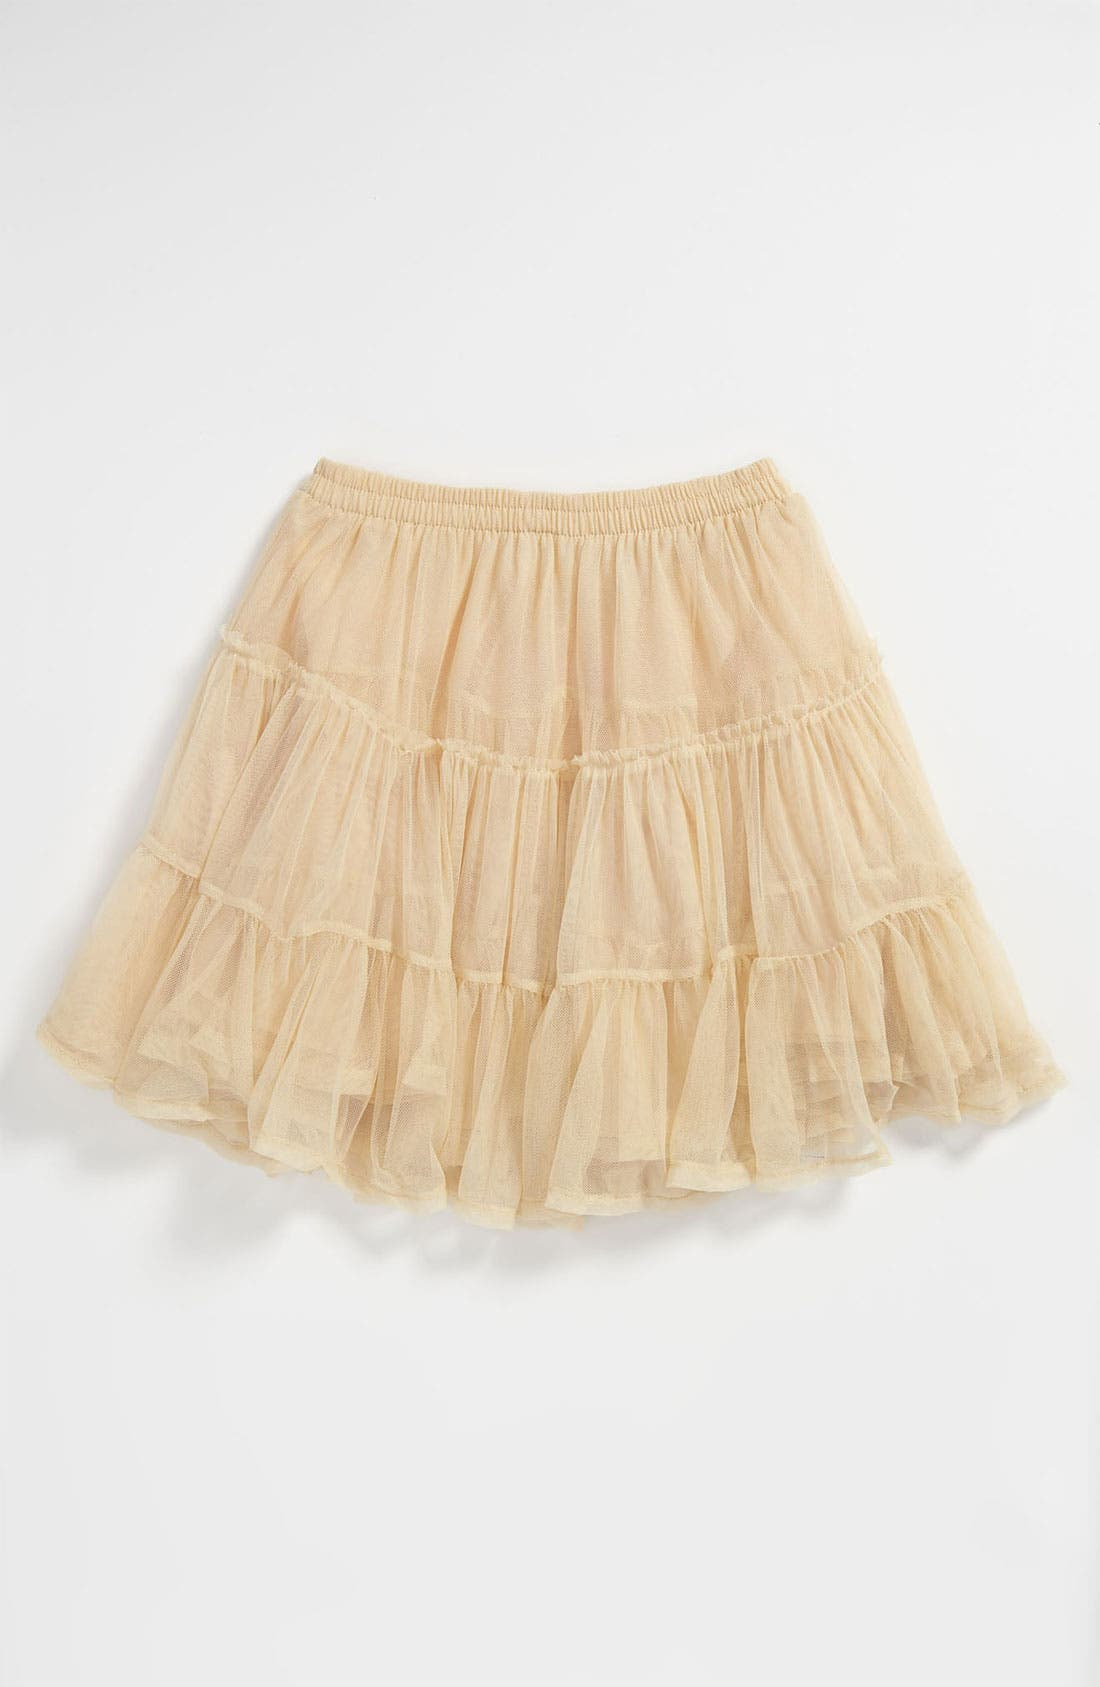 Alternate Image 1 Selected - Penny Candy 'Clara' Skirt (Little Girls & Big Girls)